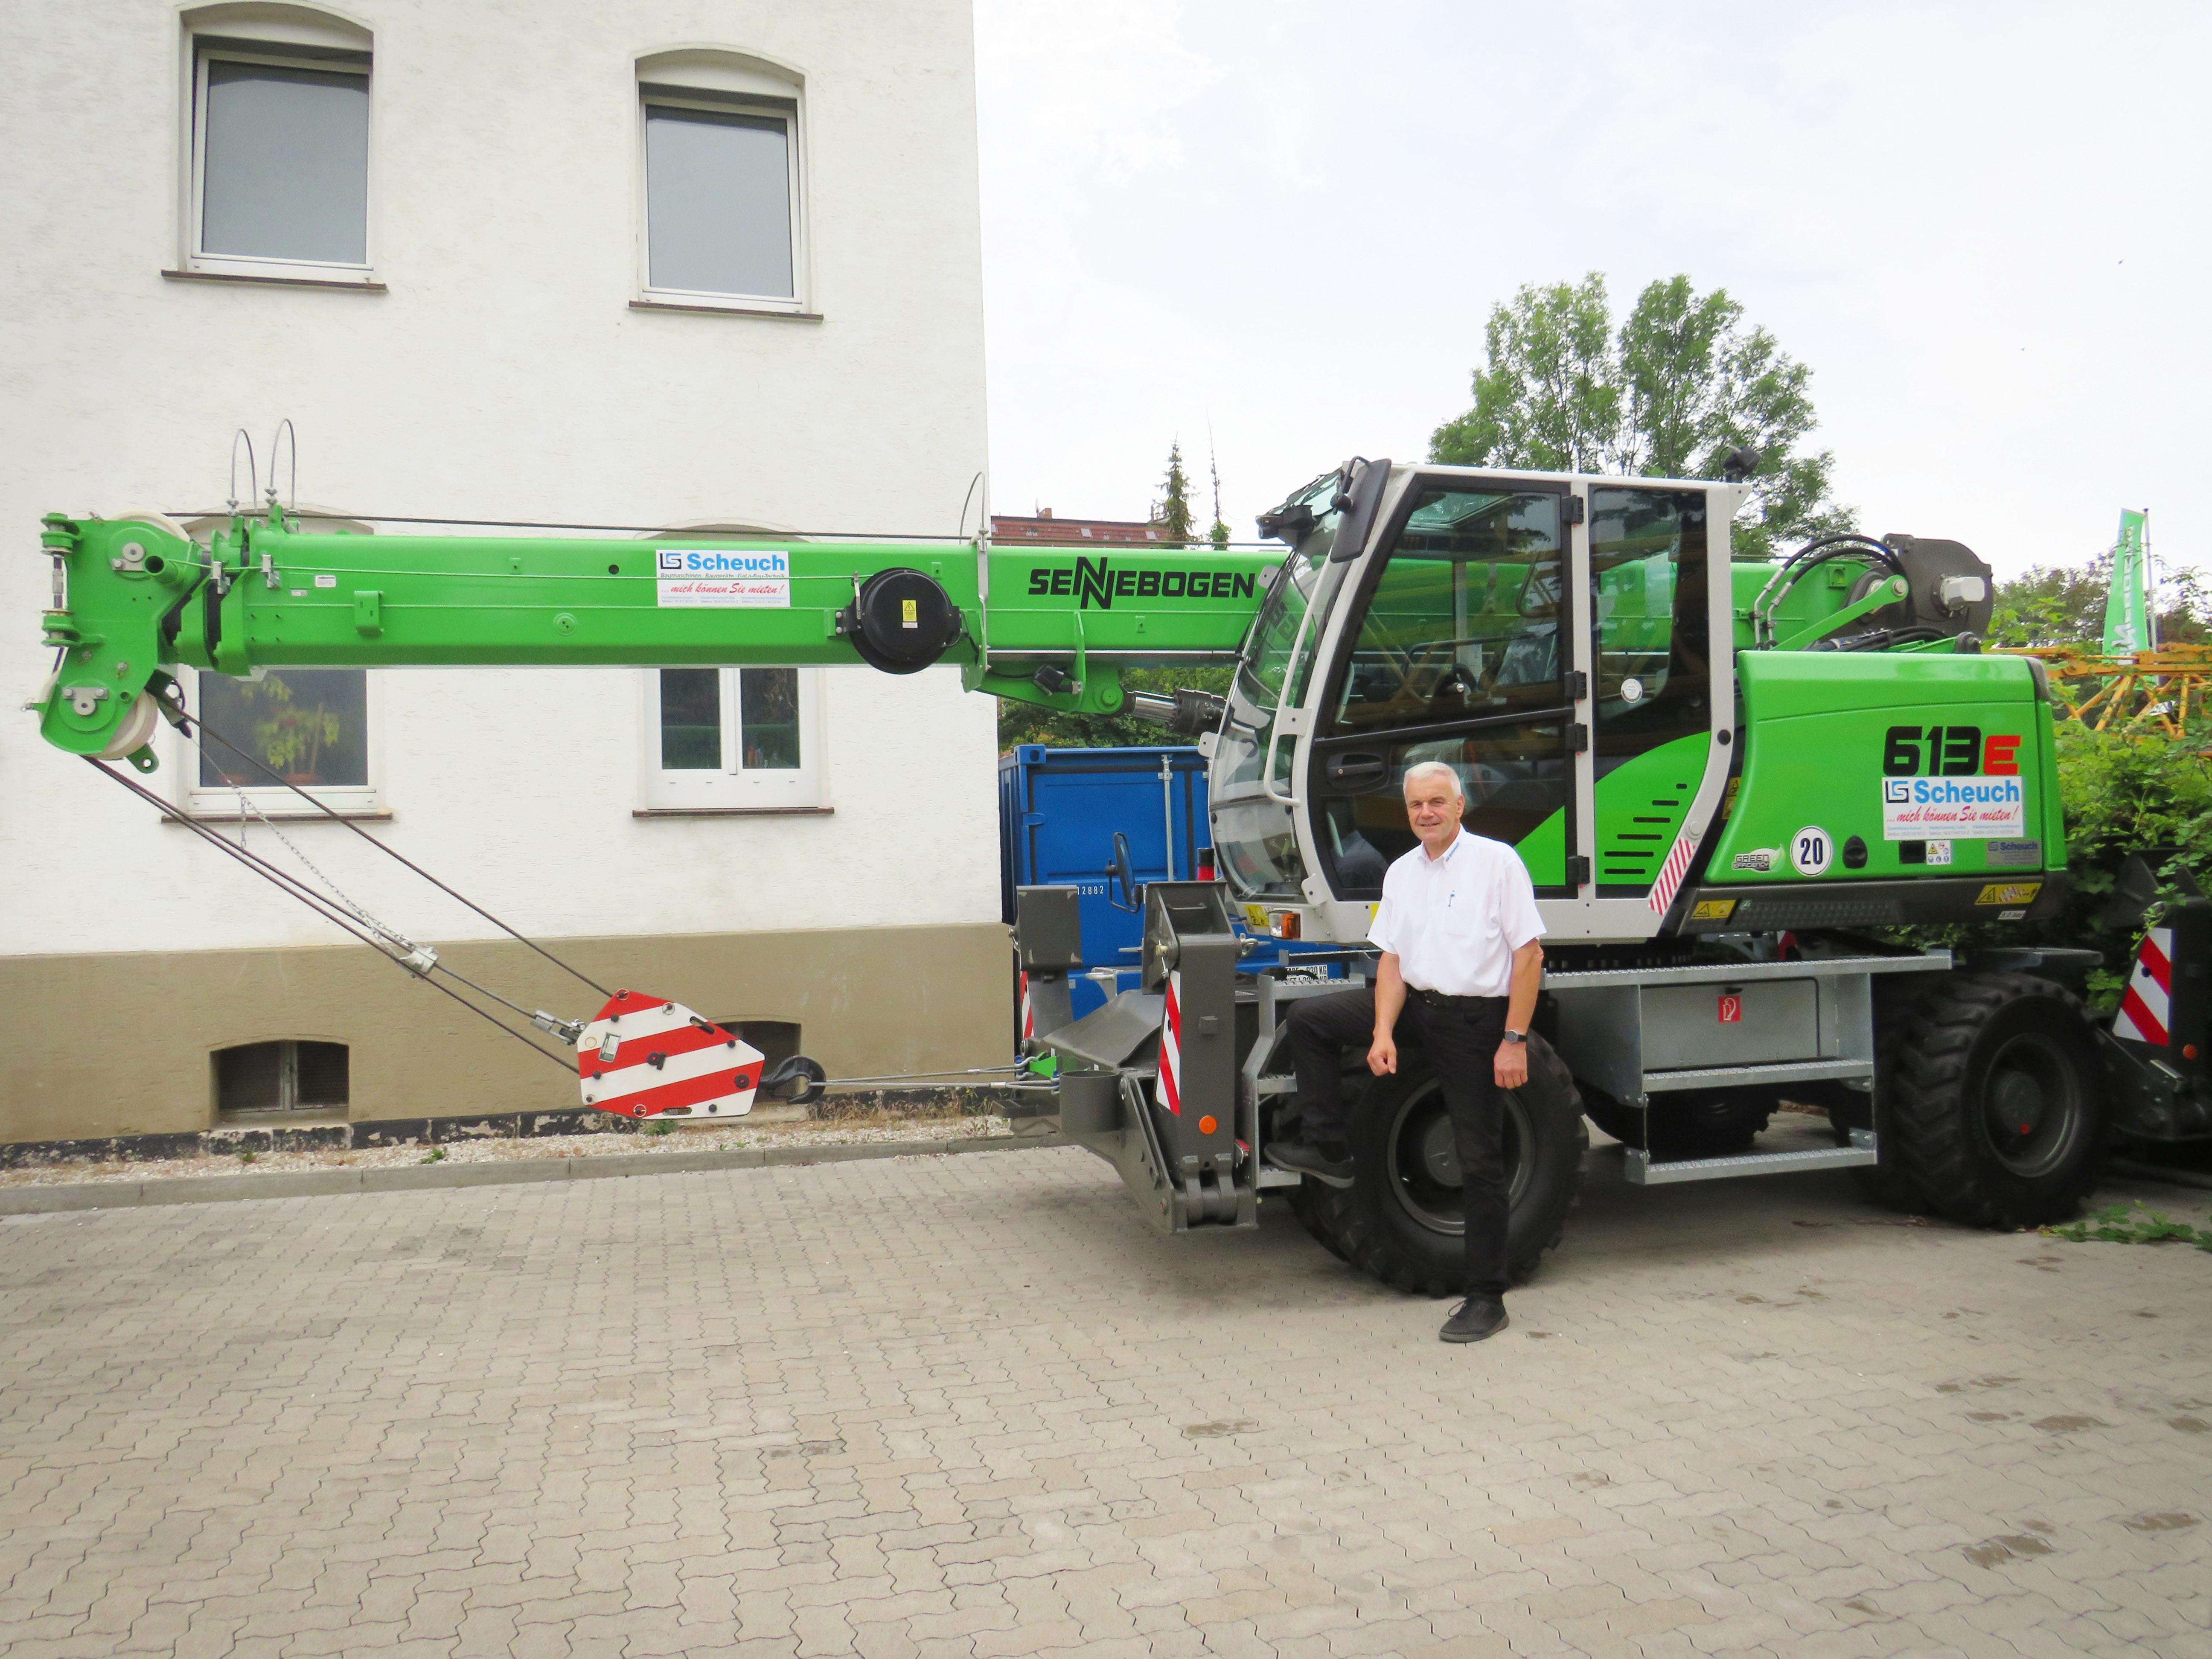 Teleskopkran Tele-Kran Kran Sennebogen 613E Mobil neu in unserem Mietpark